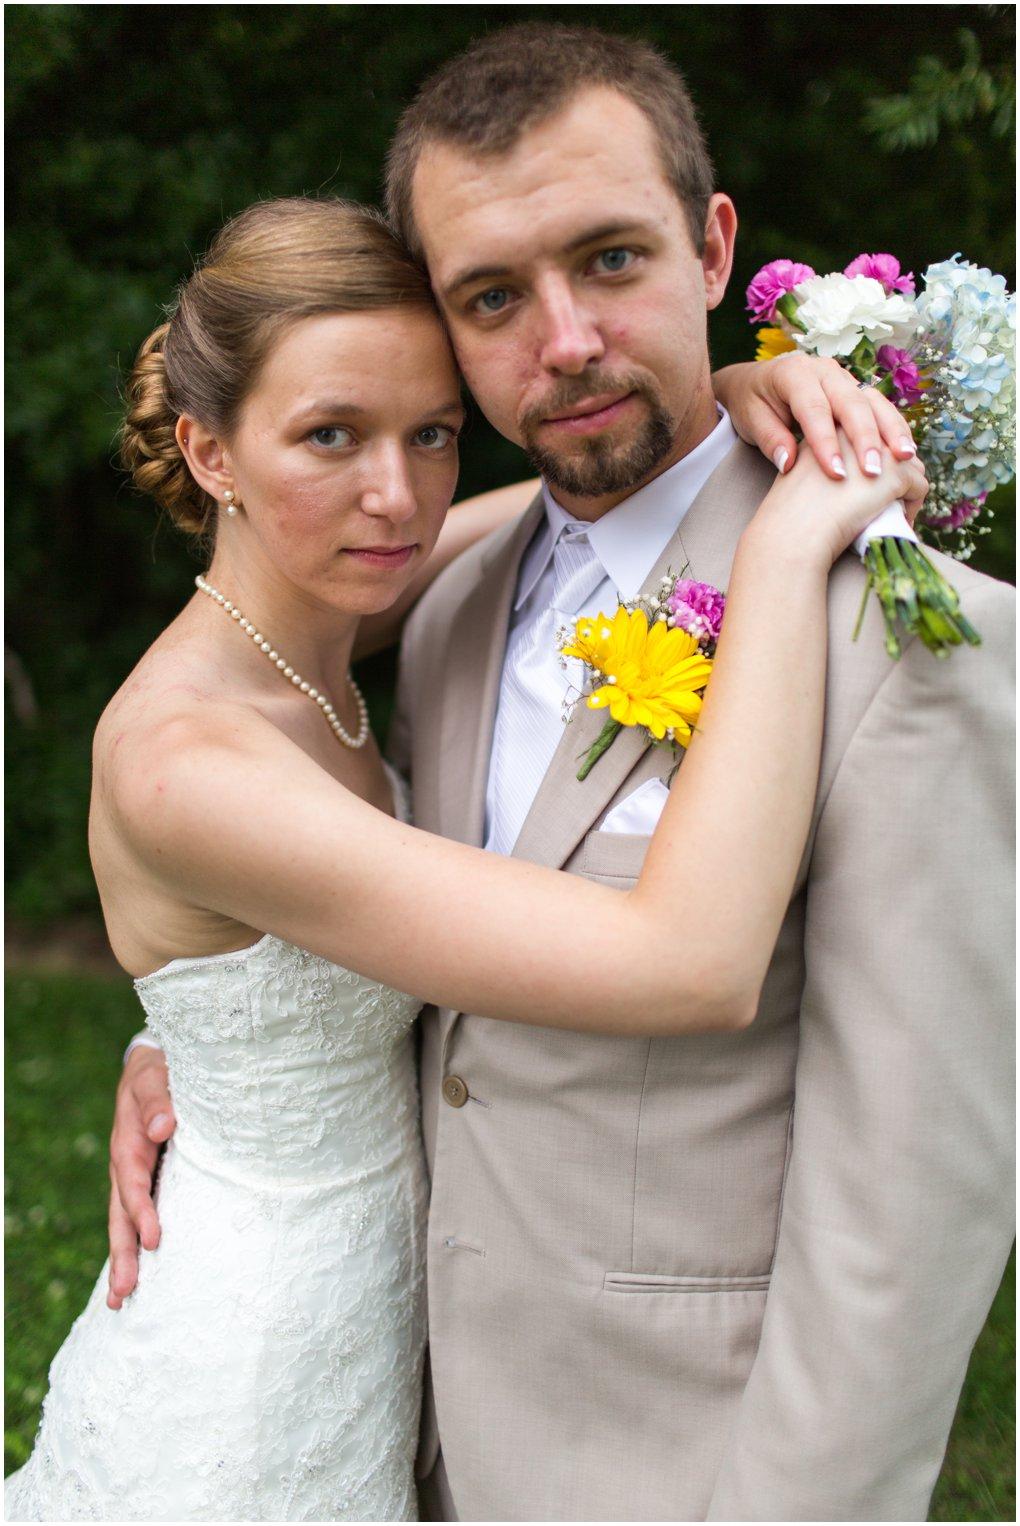 hudgins-wedding-2013-728.jpg